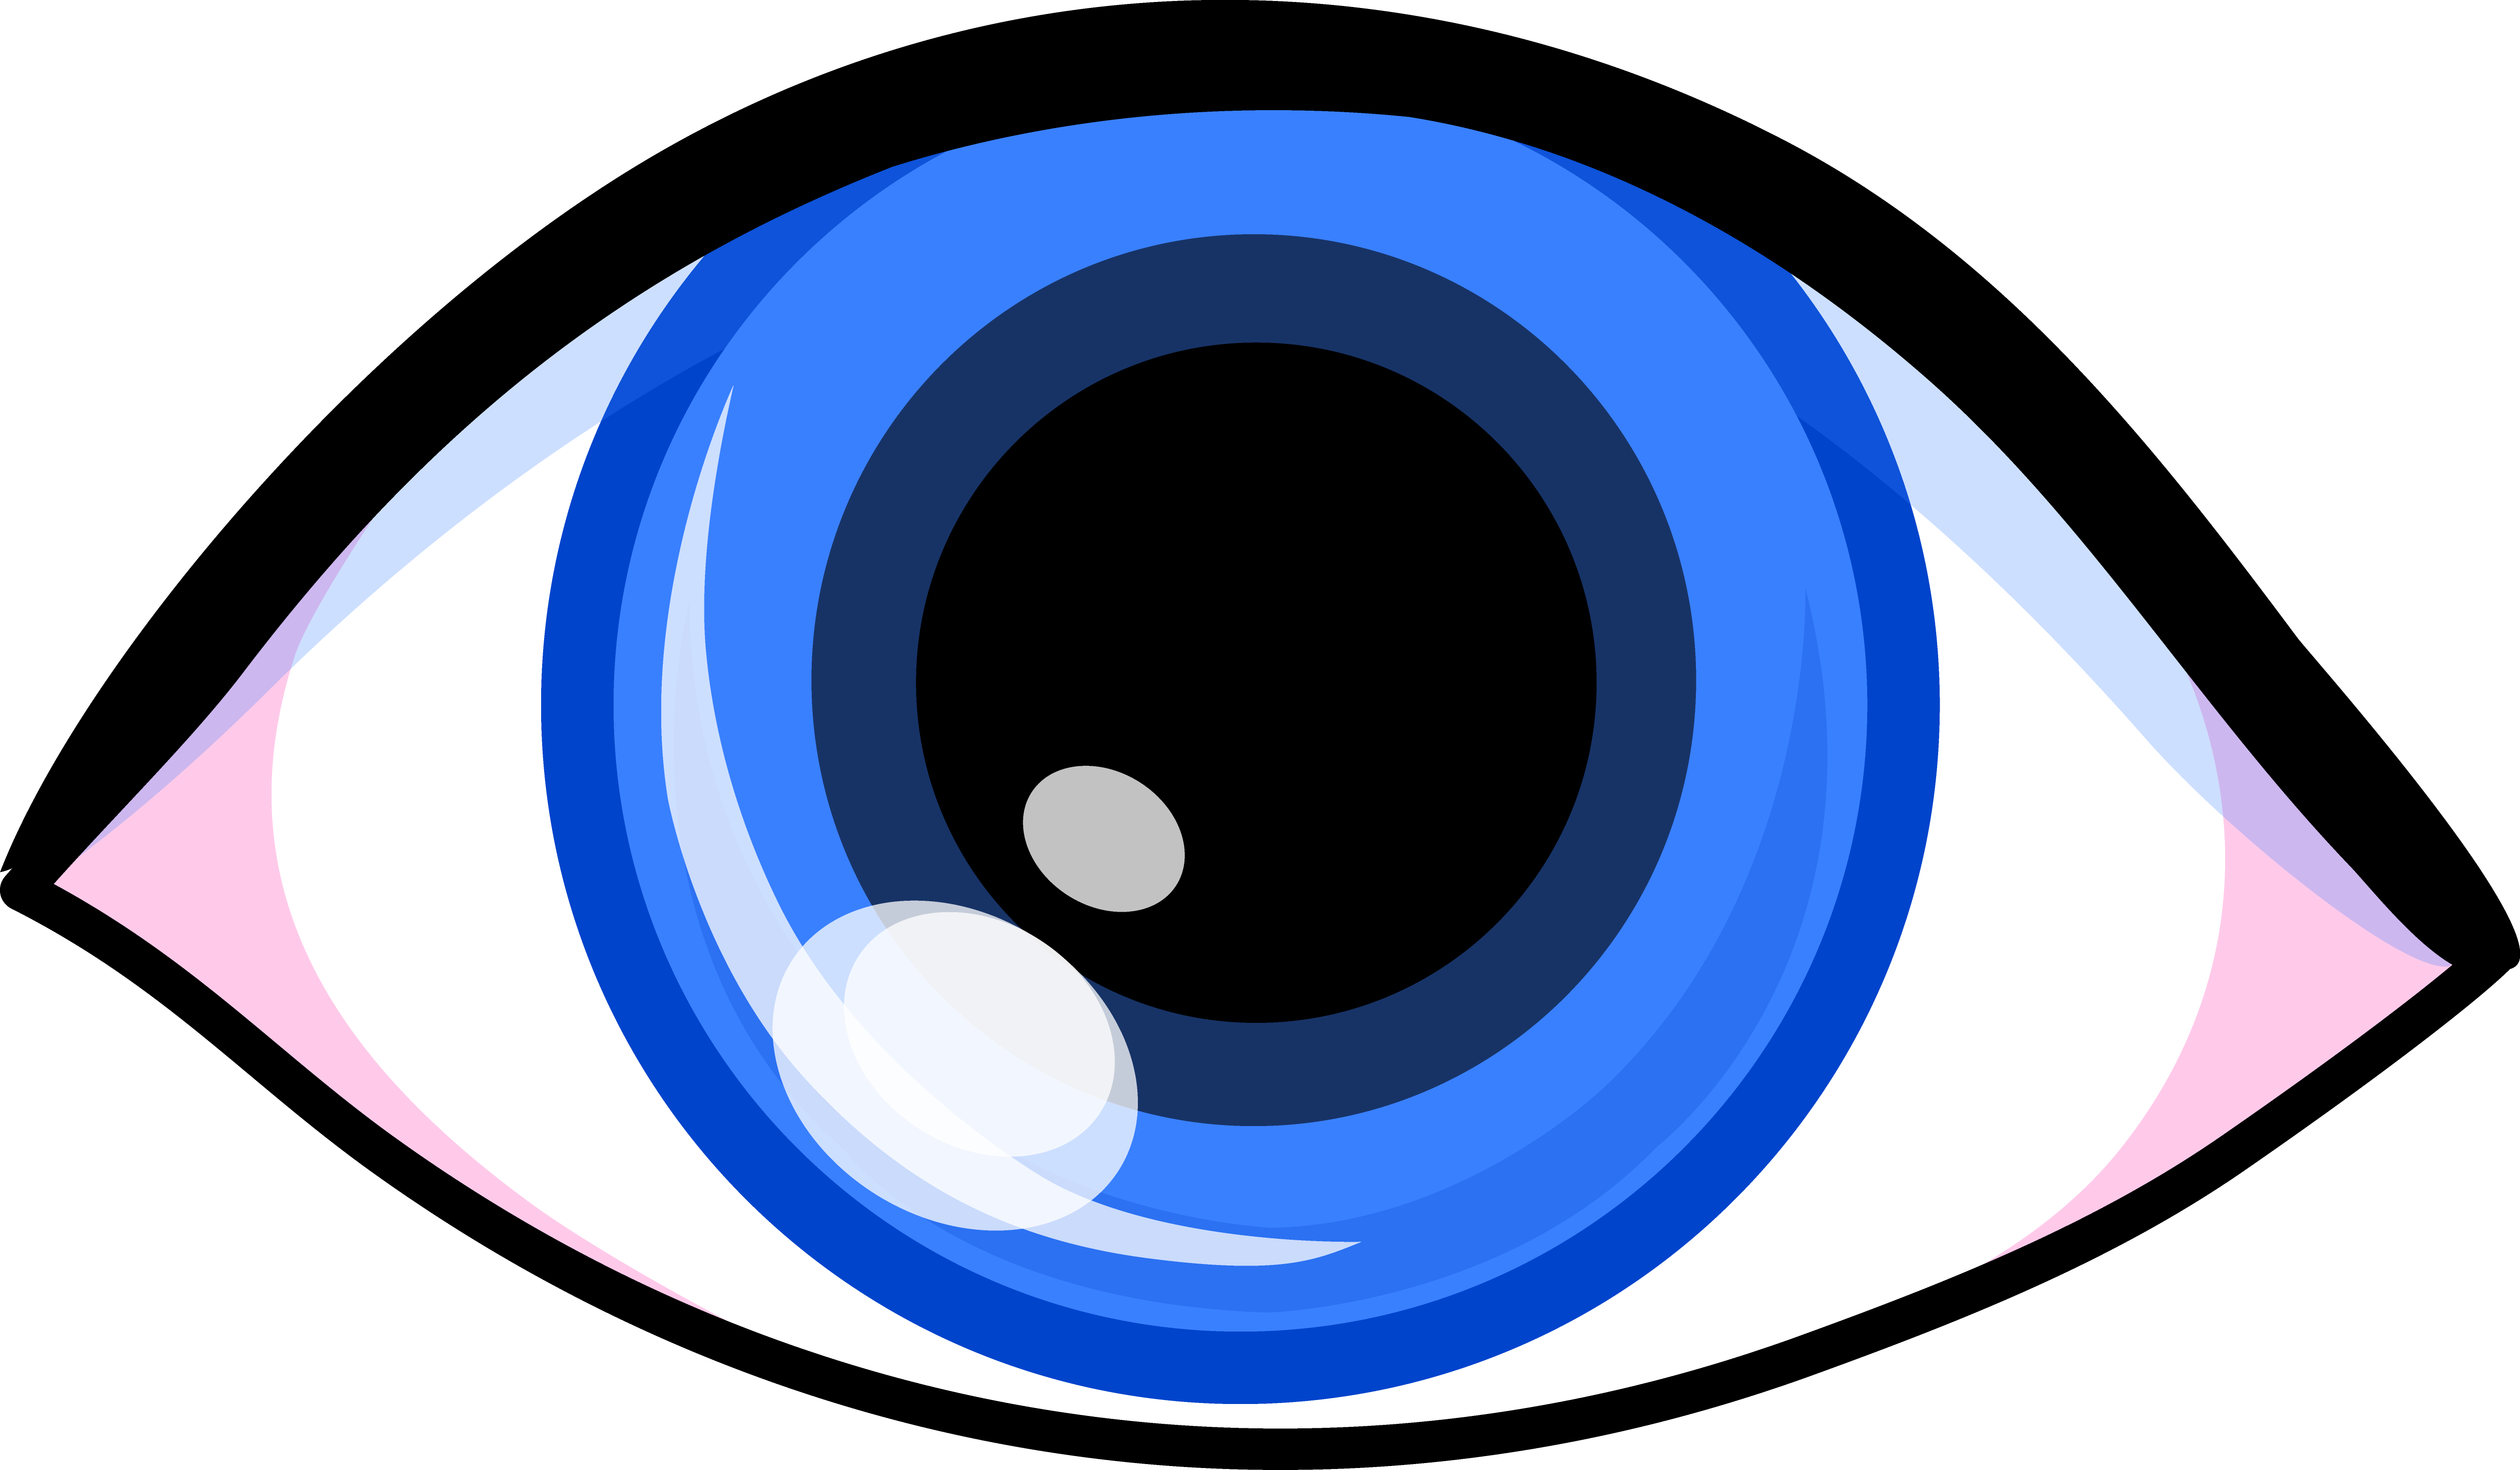 hepatitis clipart u0026middot; eyeball clipart